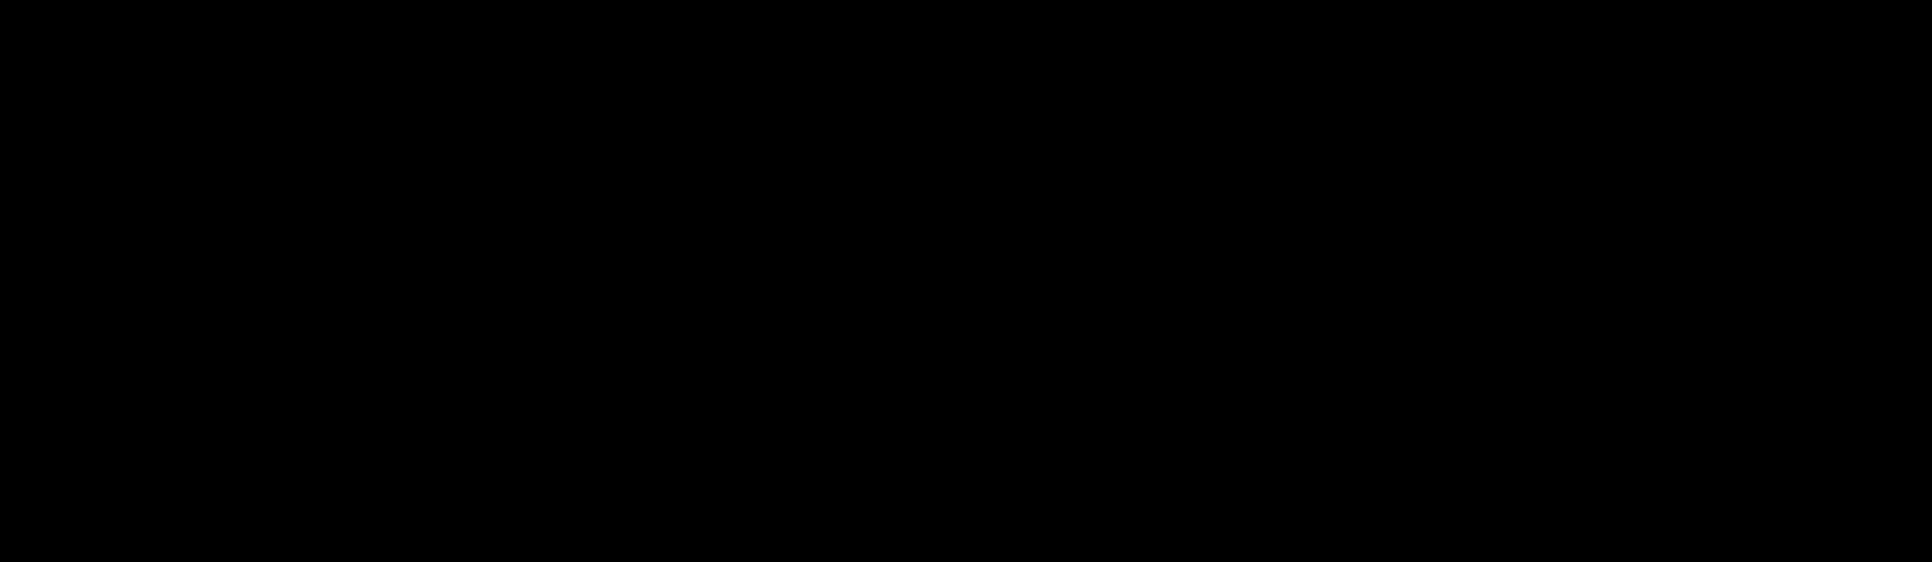 Ibuprofen-d<sub>3 </sub>acyl-β-D-glucuronide